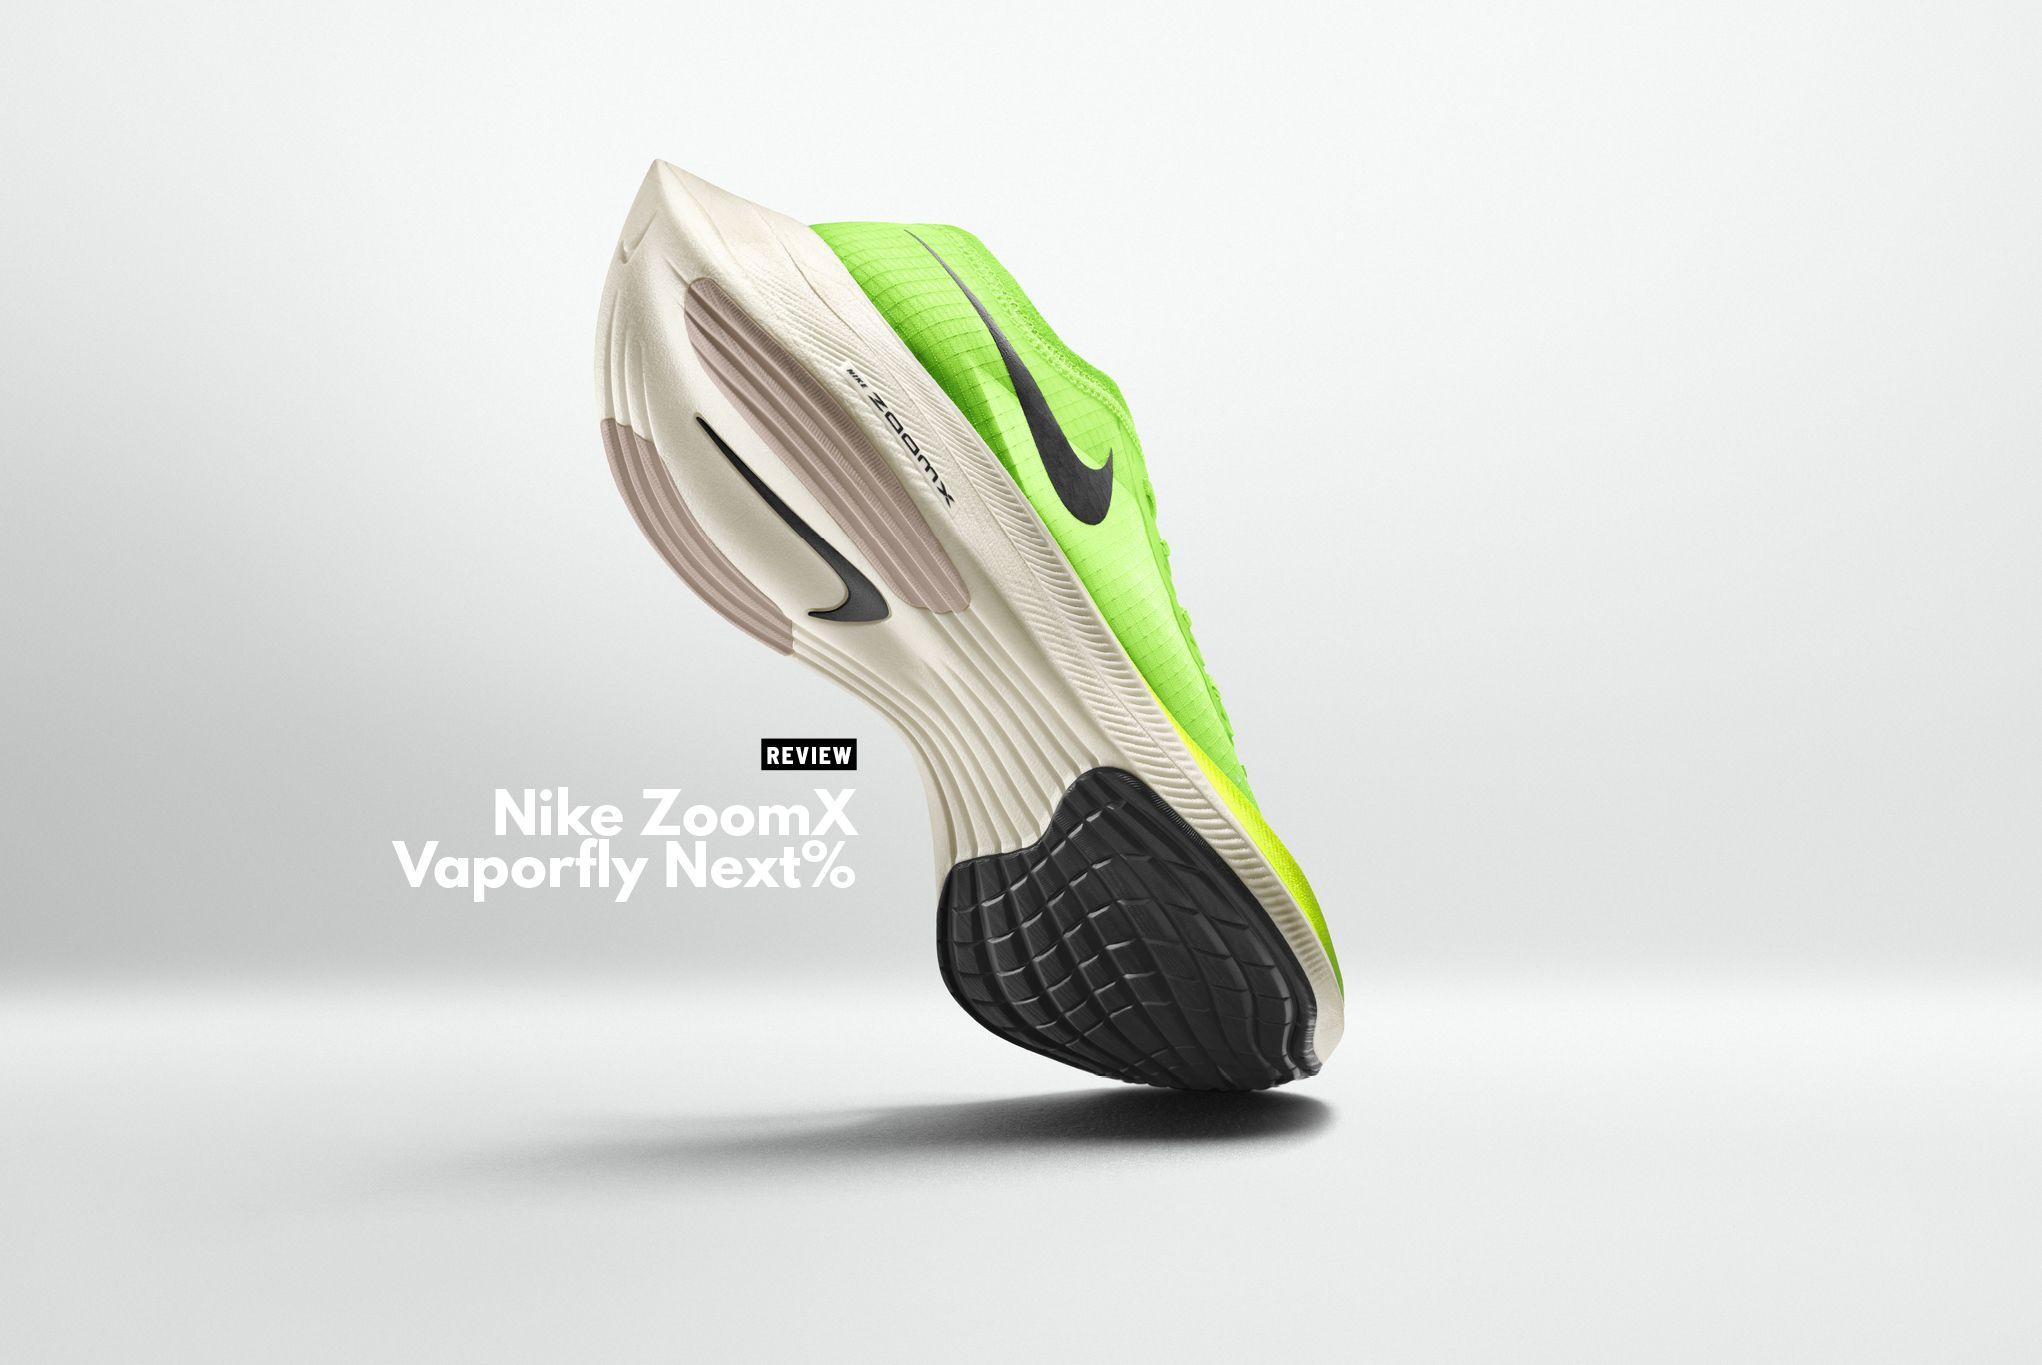 De Nike Zoomx Vaporfly Next